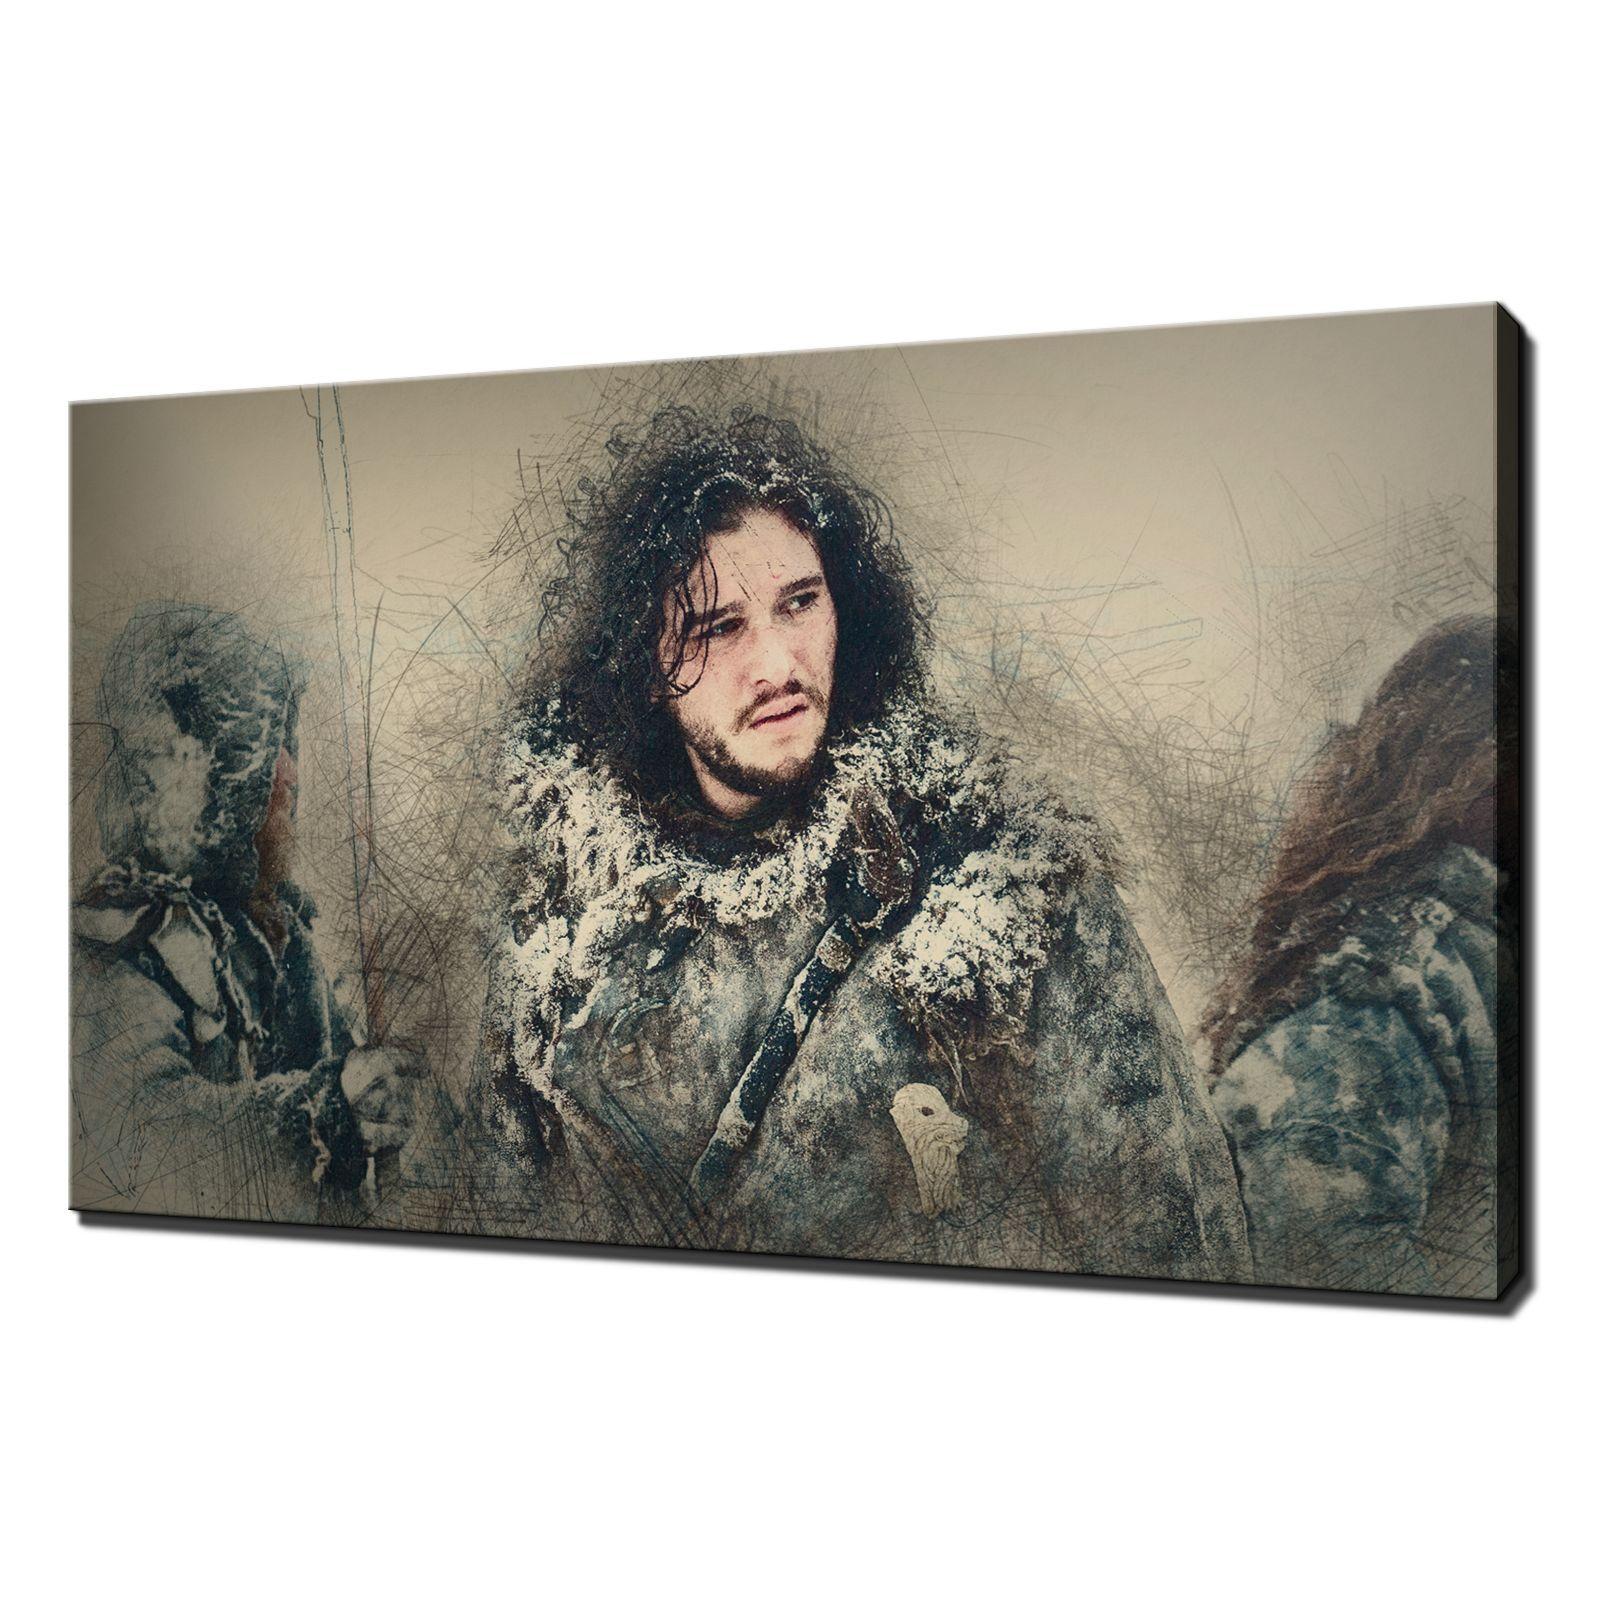 GAME of Thrones Jon Snow Tela Stampa Foto Wall Art varietà di formati